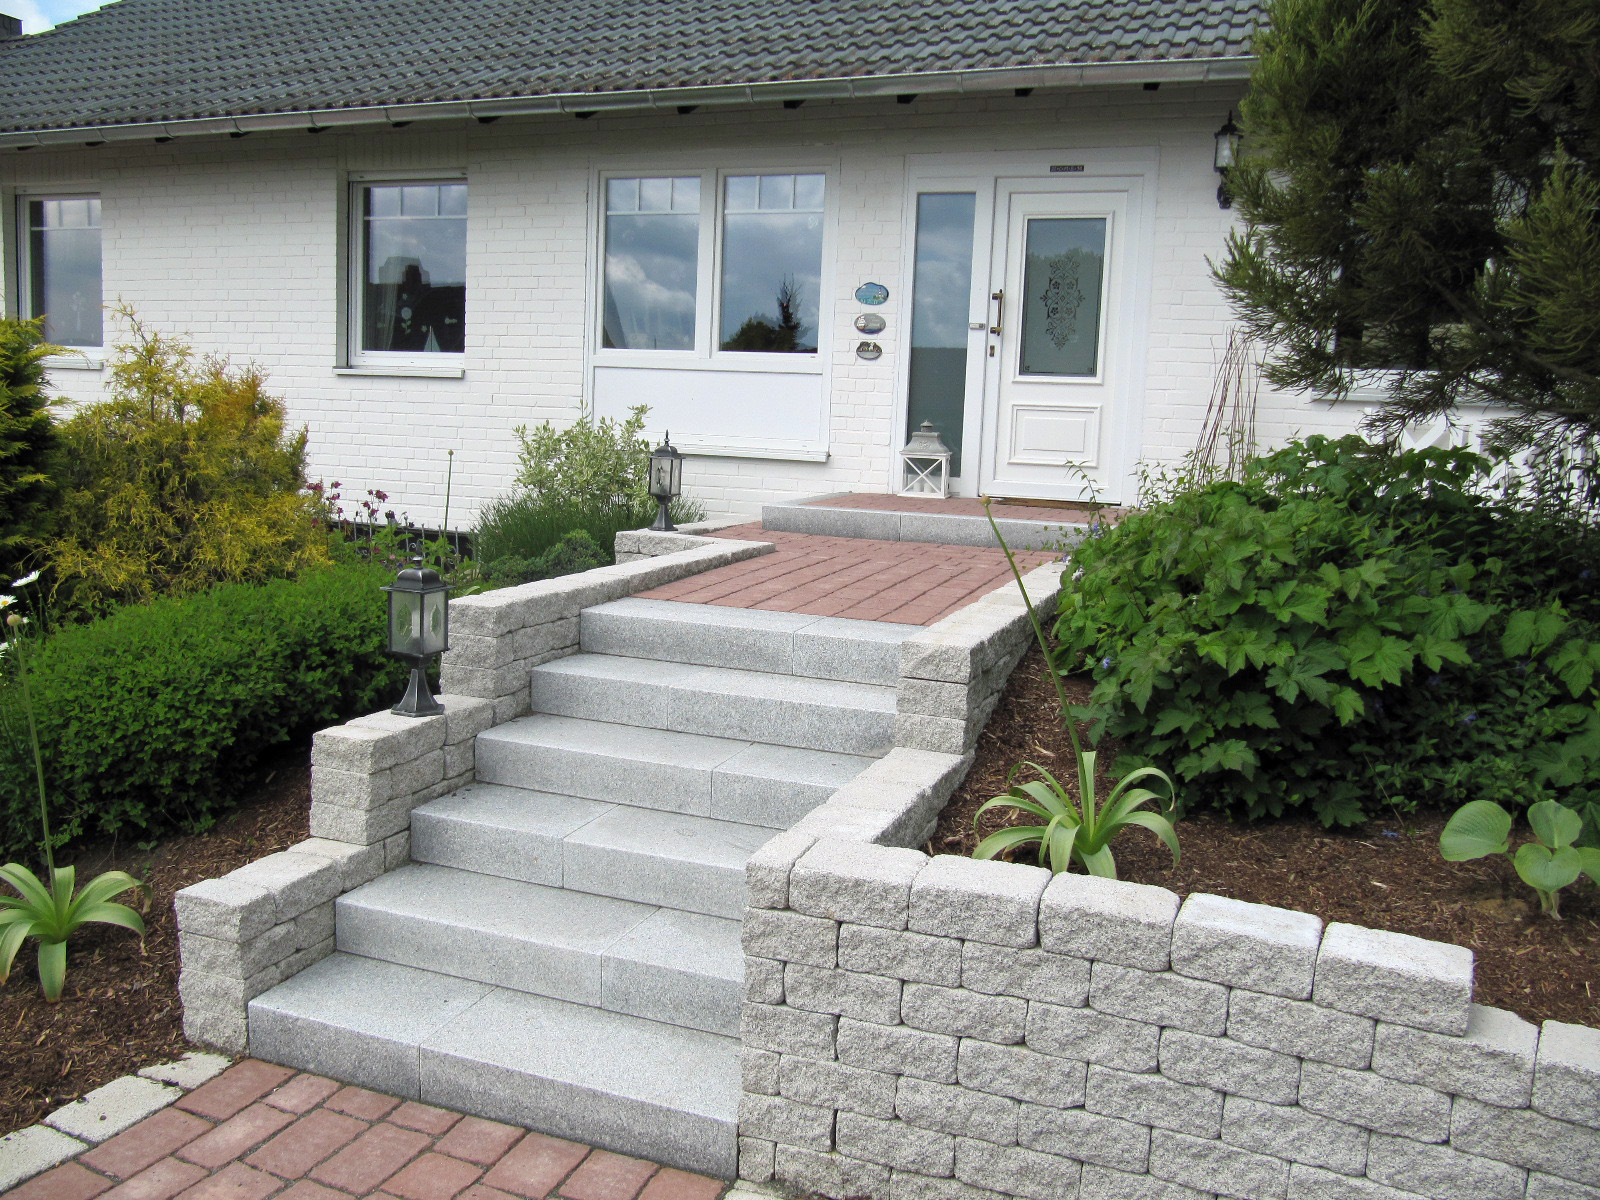 wundersch nen treppe blockstufen haus design ideen. Black Bedroom Furniture Sets. Home Design Ideas